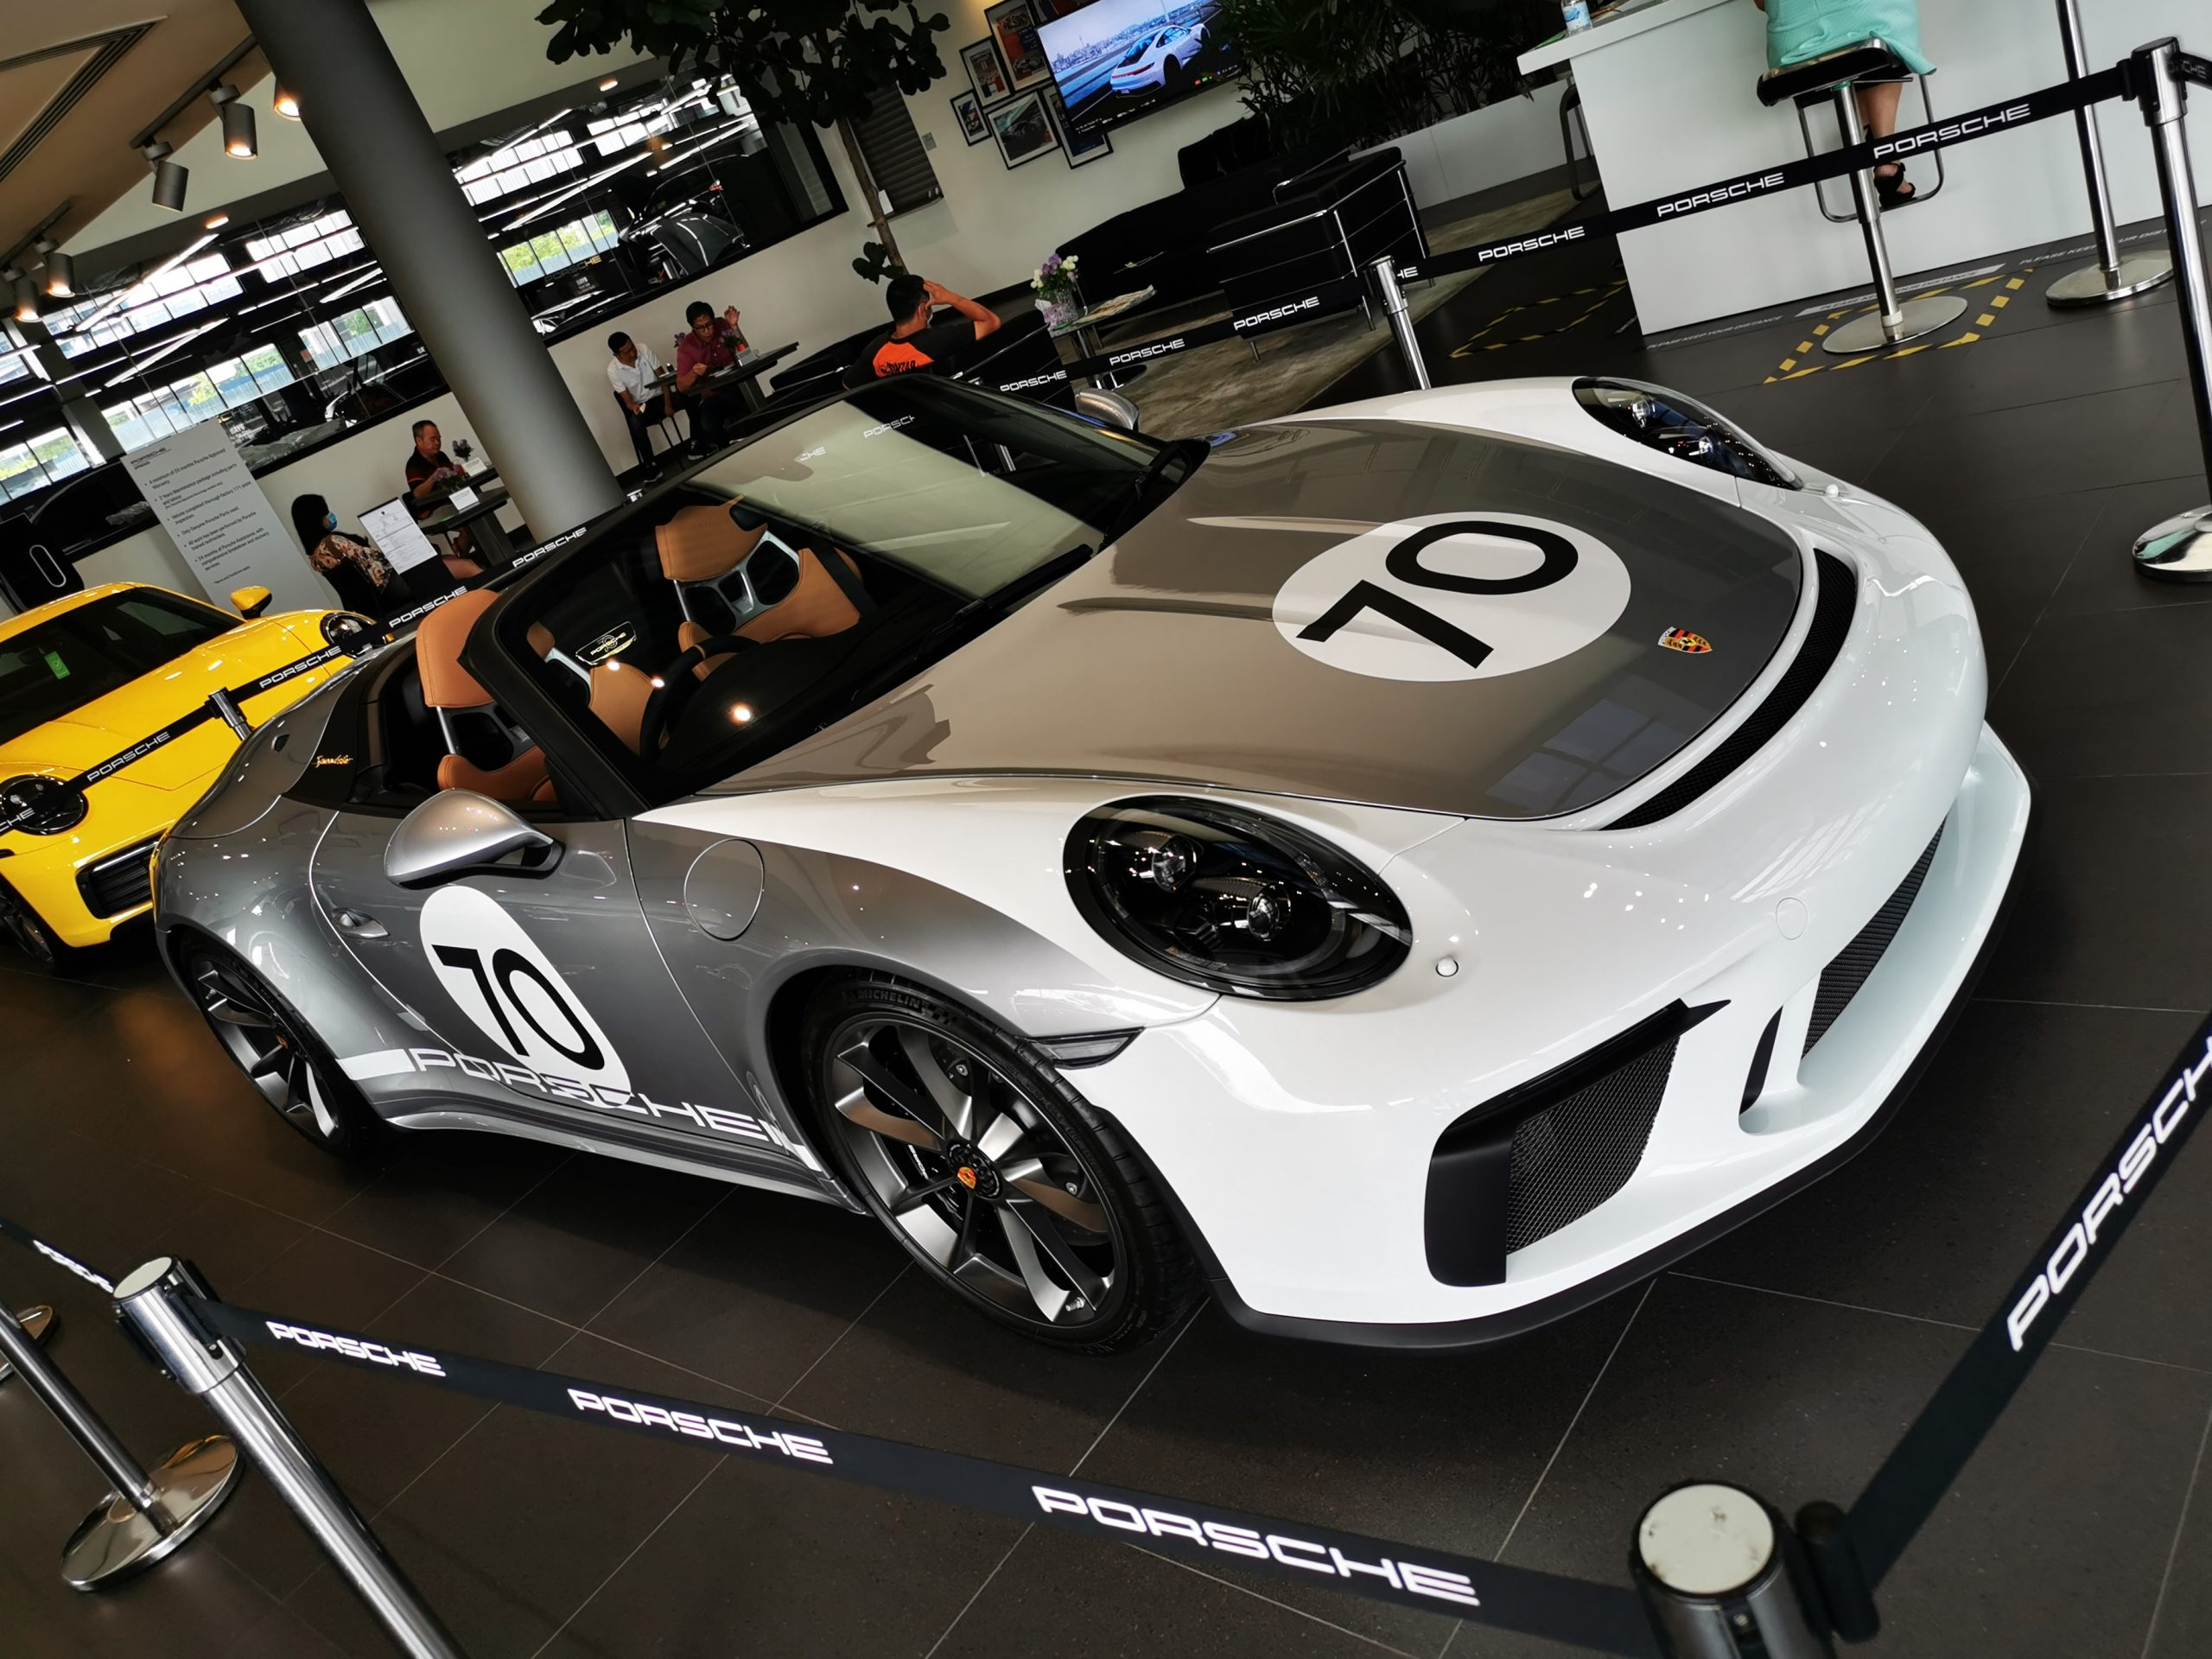 Porsche 911 front right view